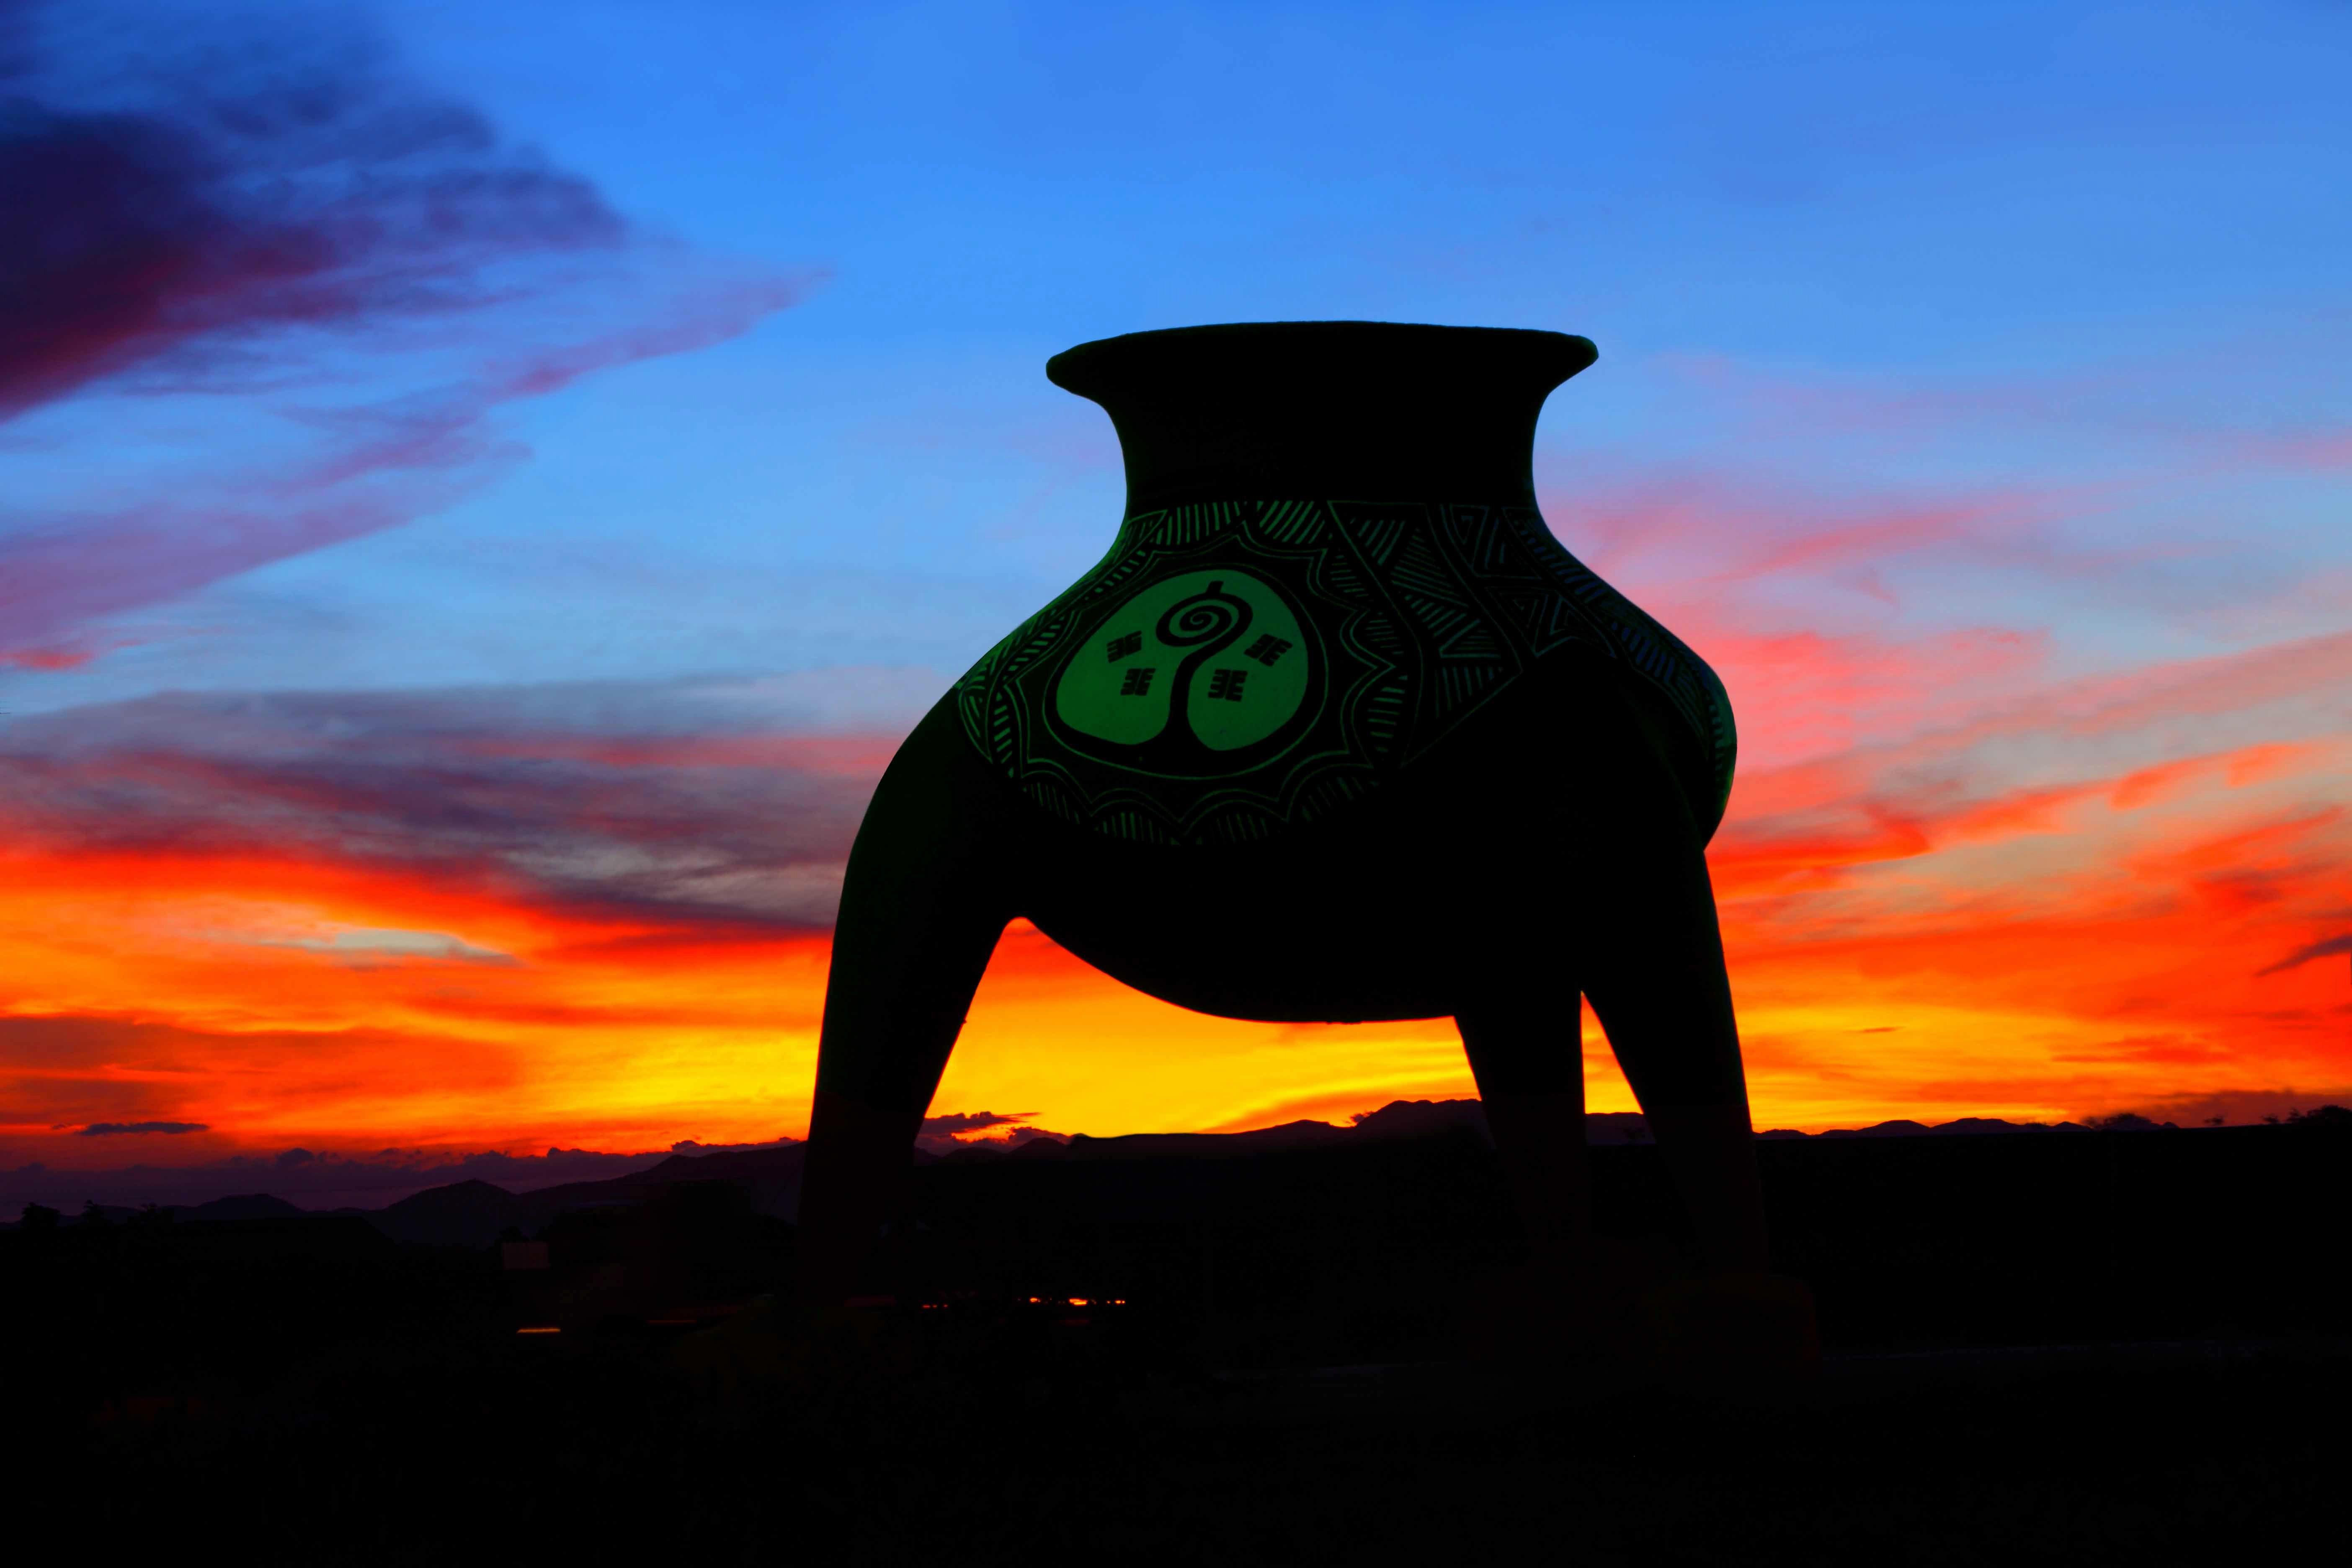 Tinaja De Quibor Monumento Imponente Que Refleja La Cultura